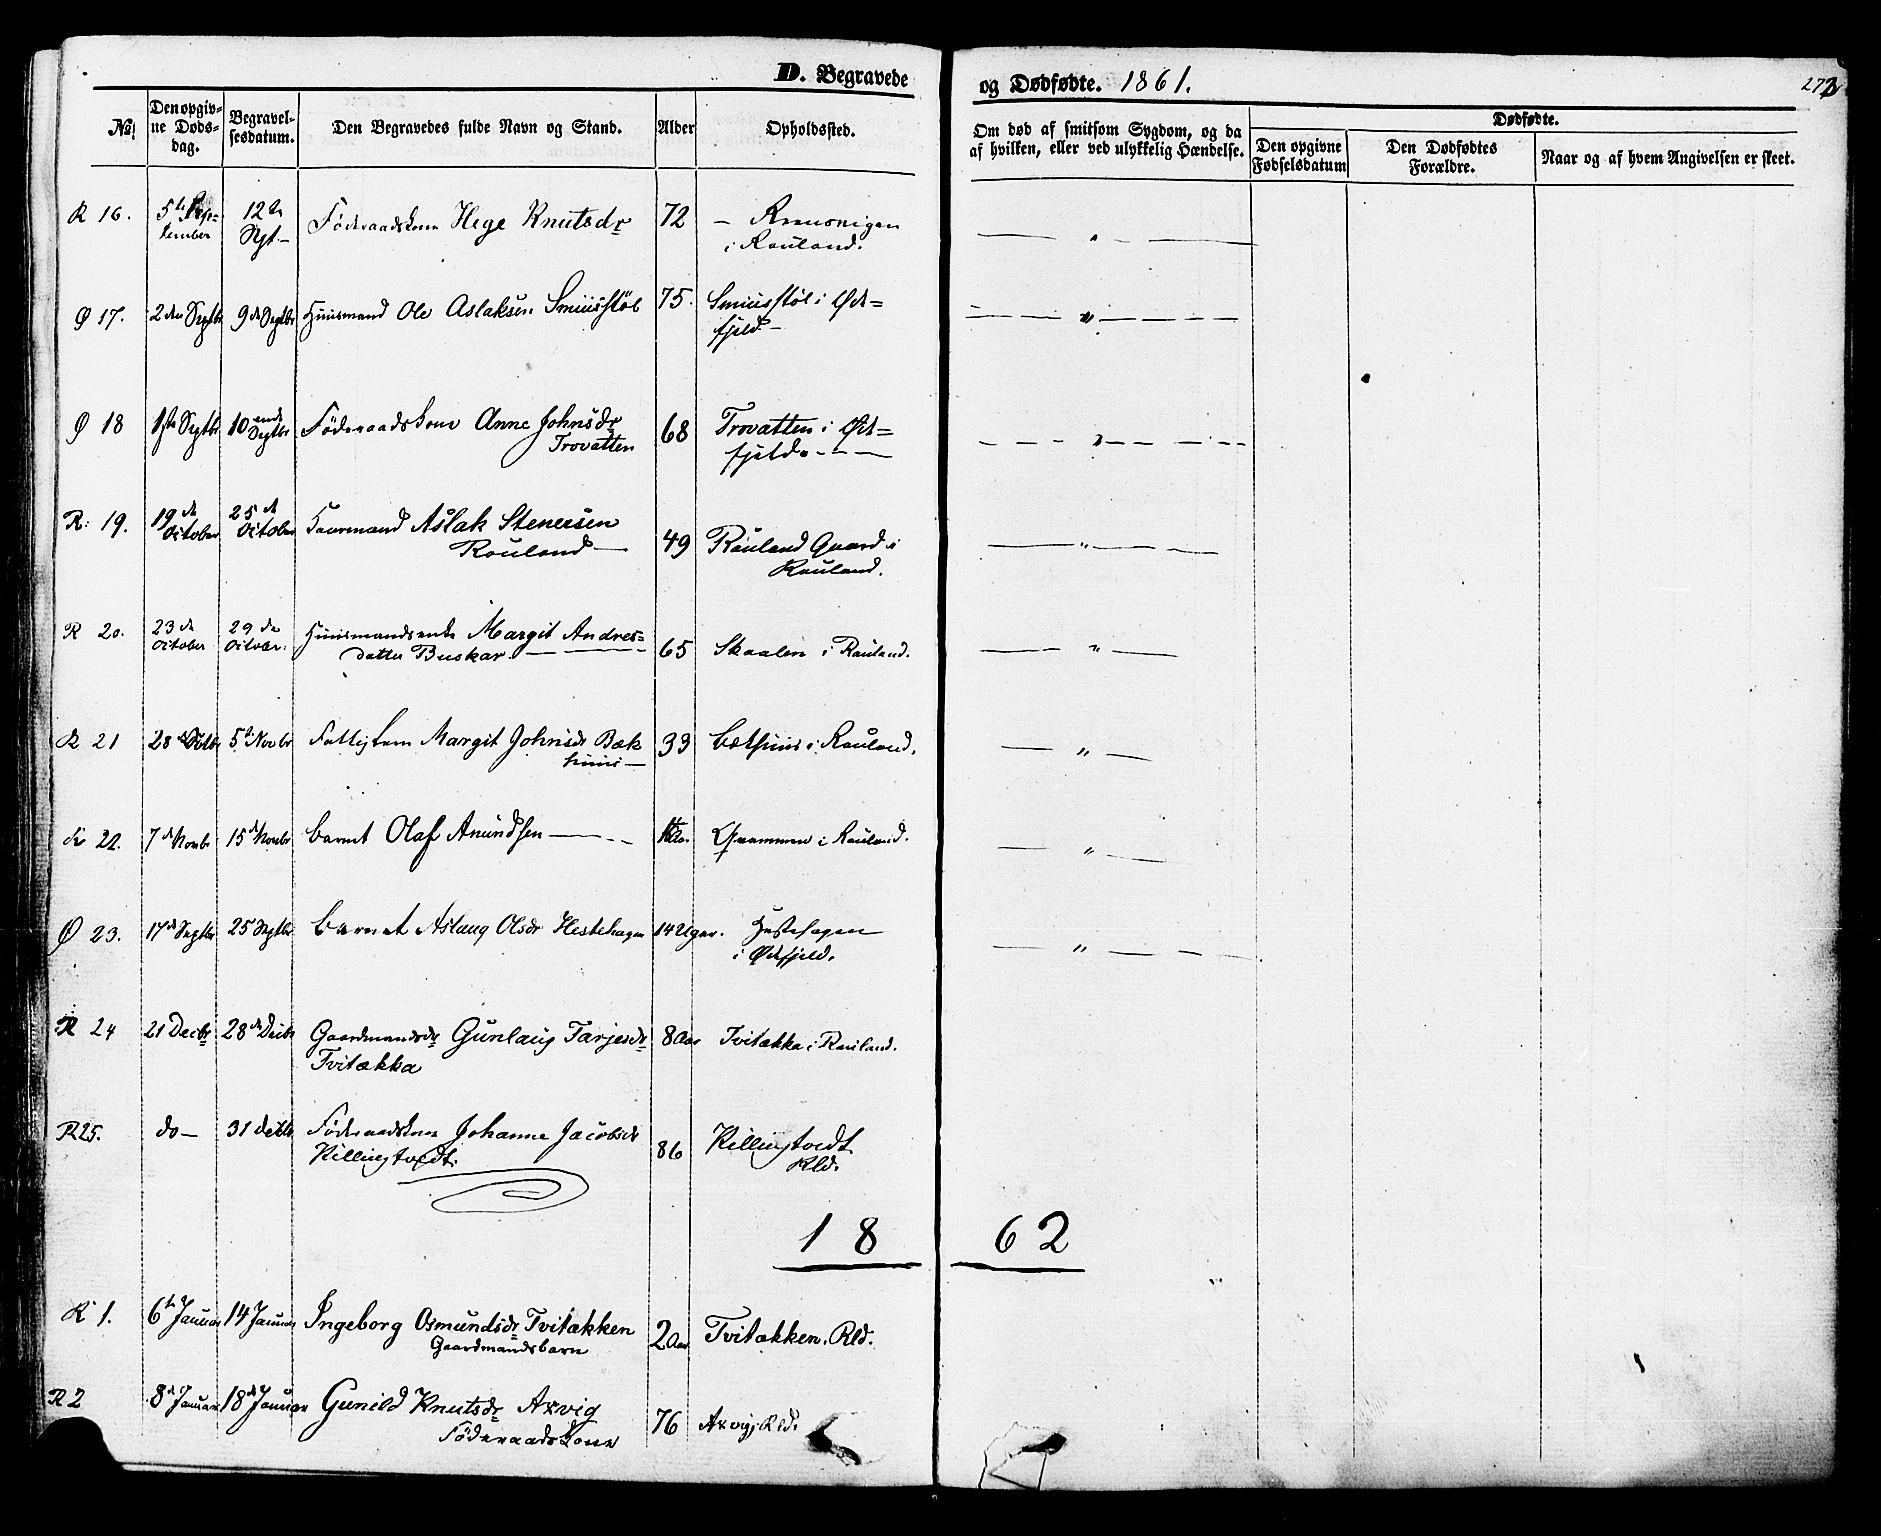 SAKO, Rauland kirkebøker, F/Fa/L0003: Ministerialbok nr. 3, 1859-1886, s. 273